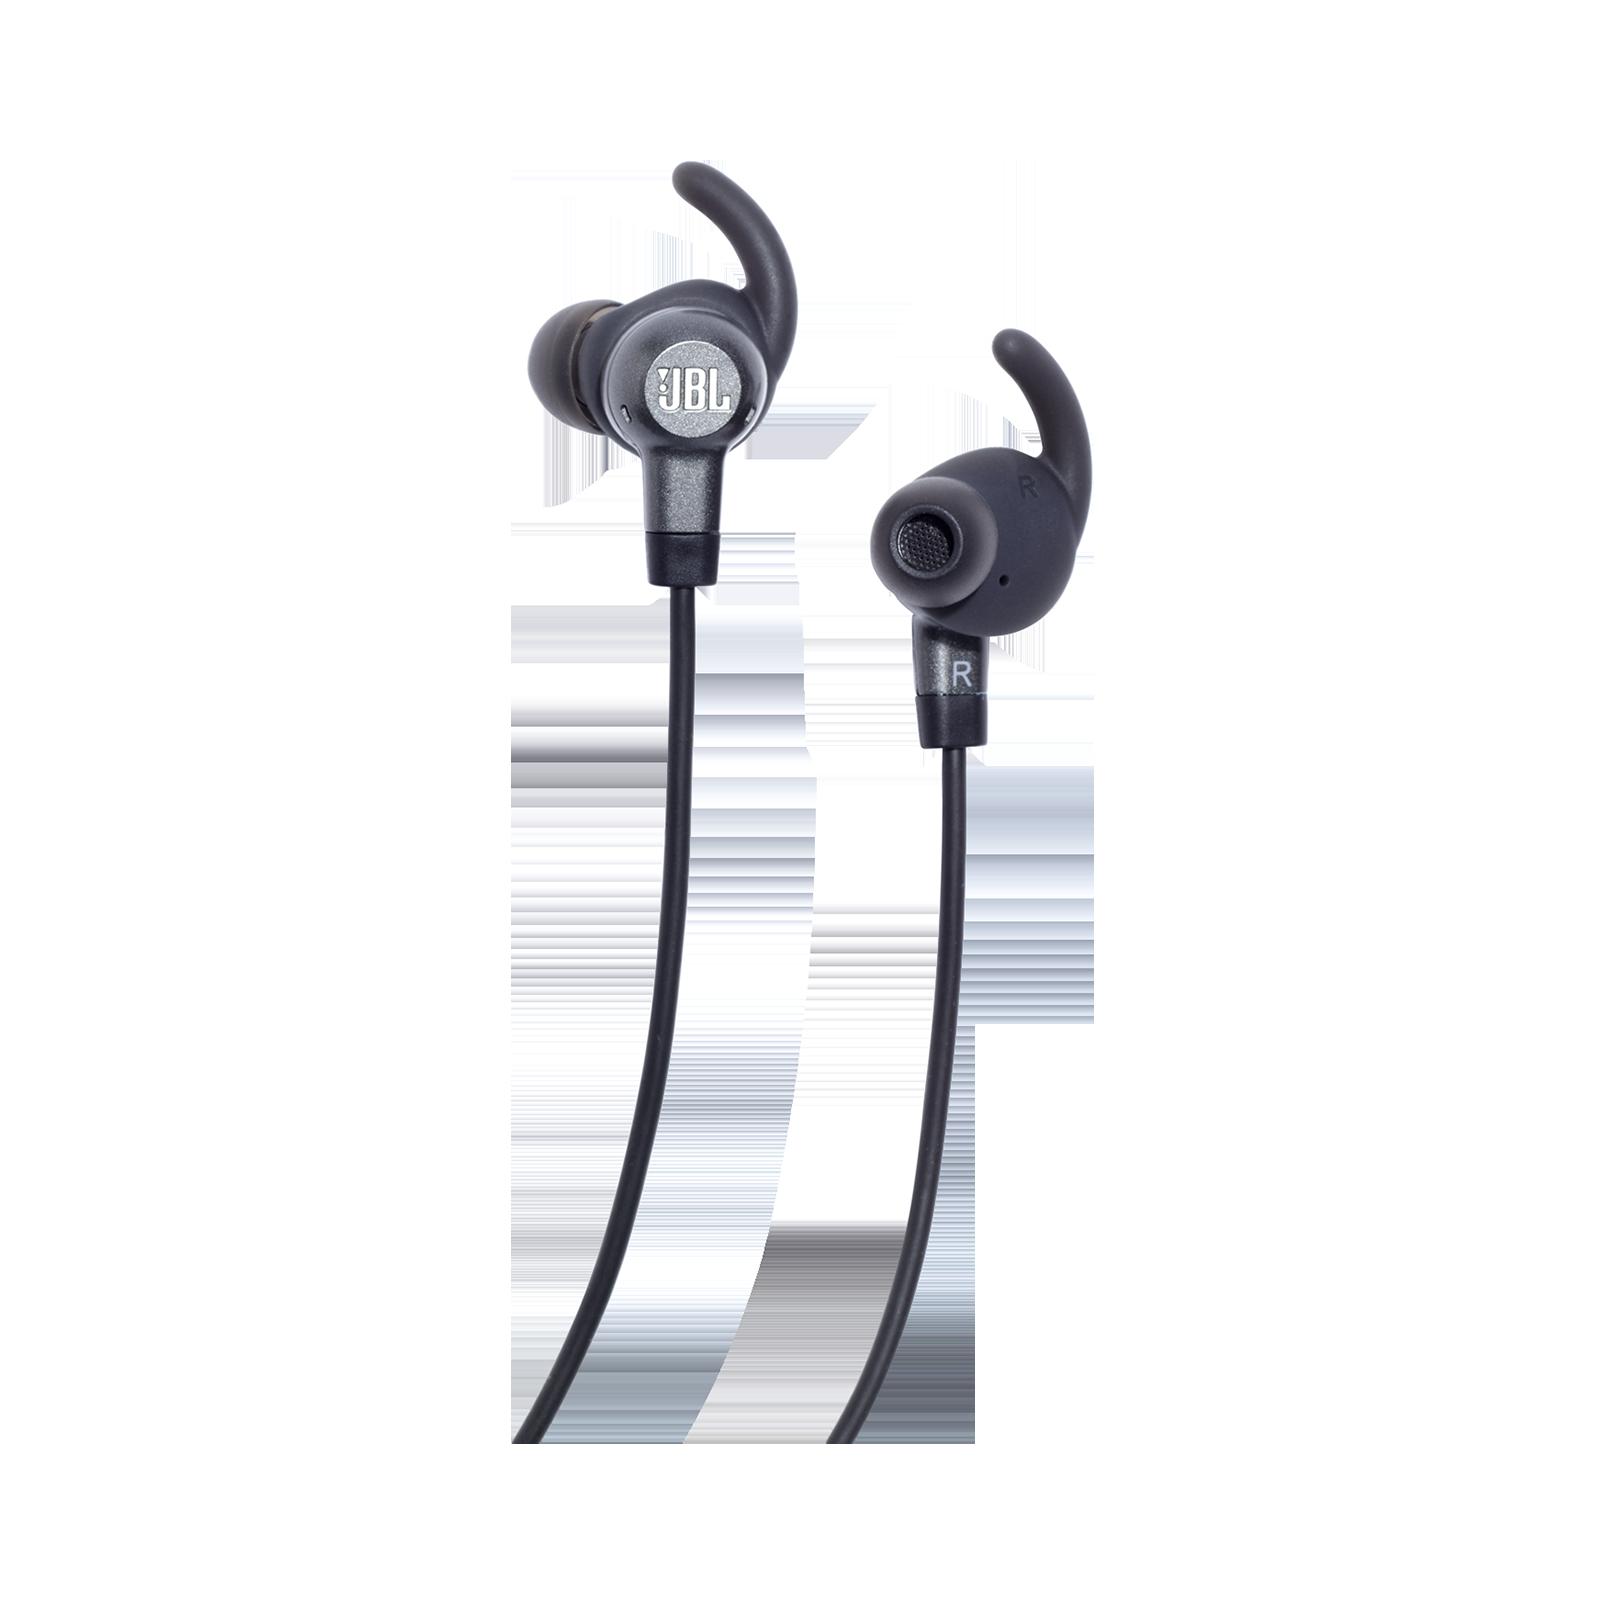 4ce88d08287 JBL EVEREST™ ELITE 150NC | Wireless In-Ear NC headphones